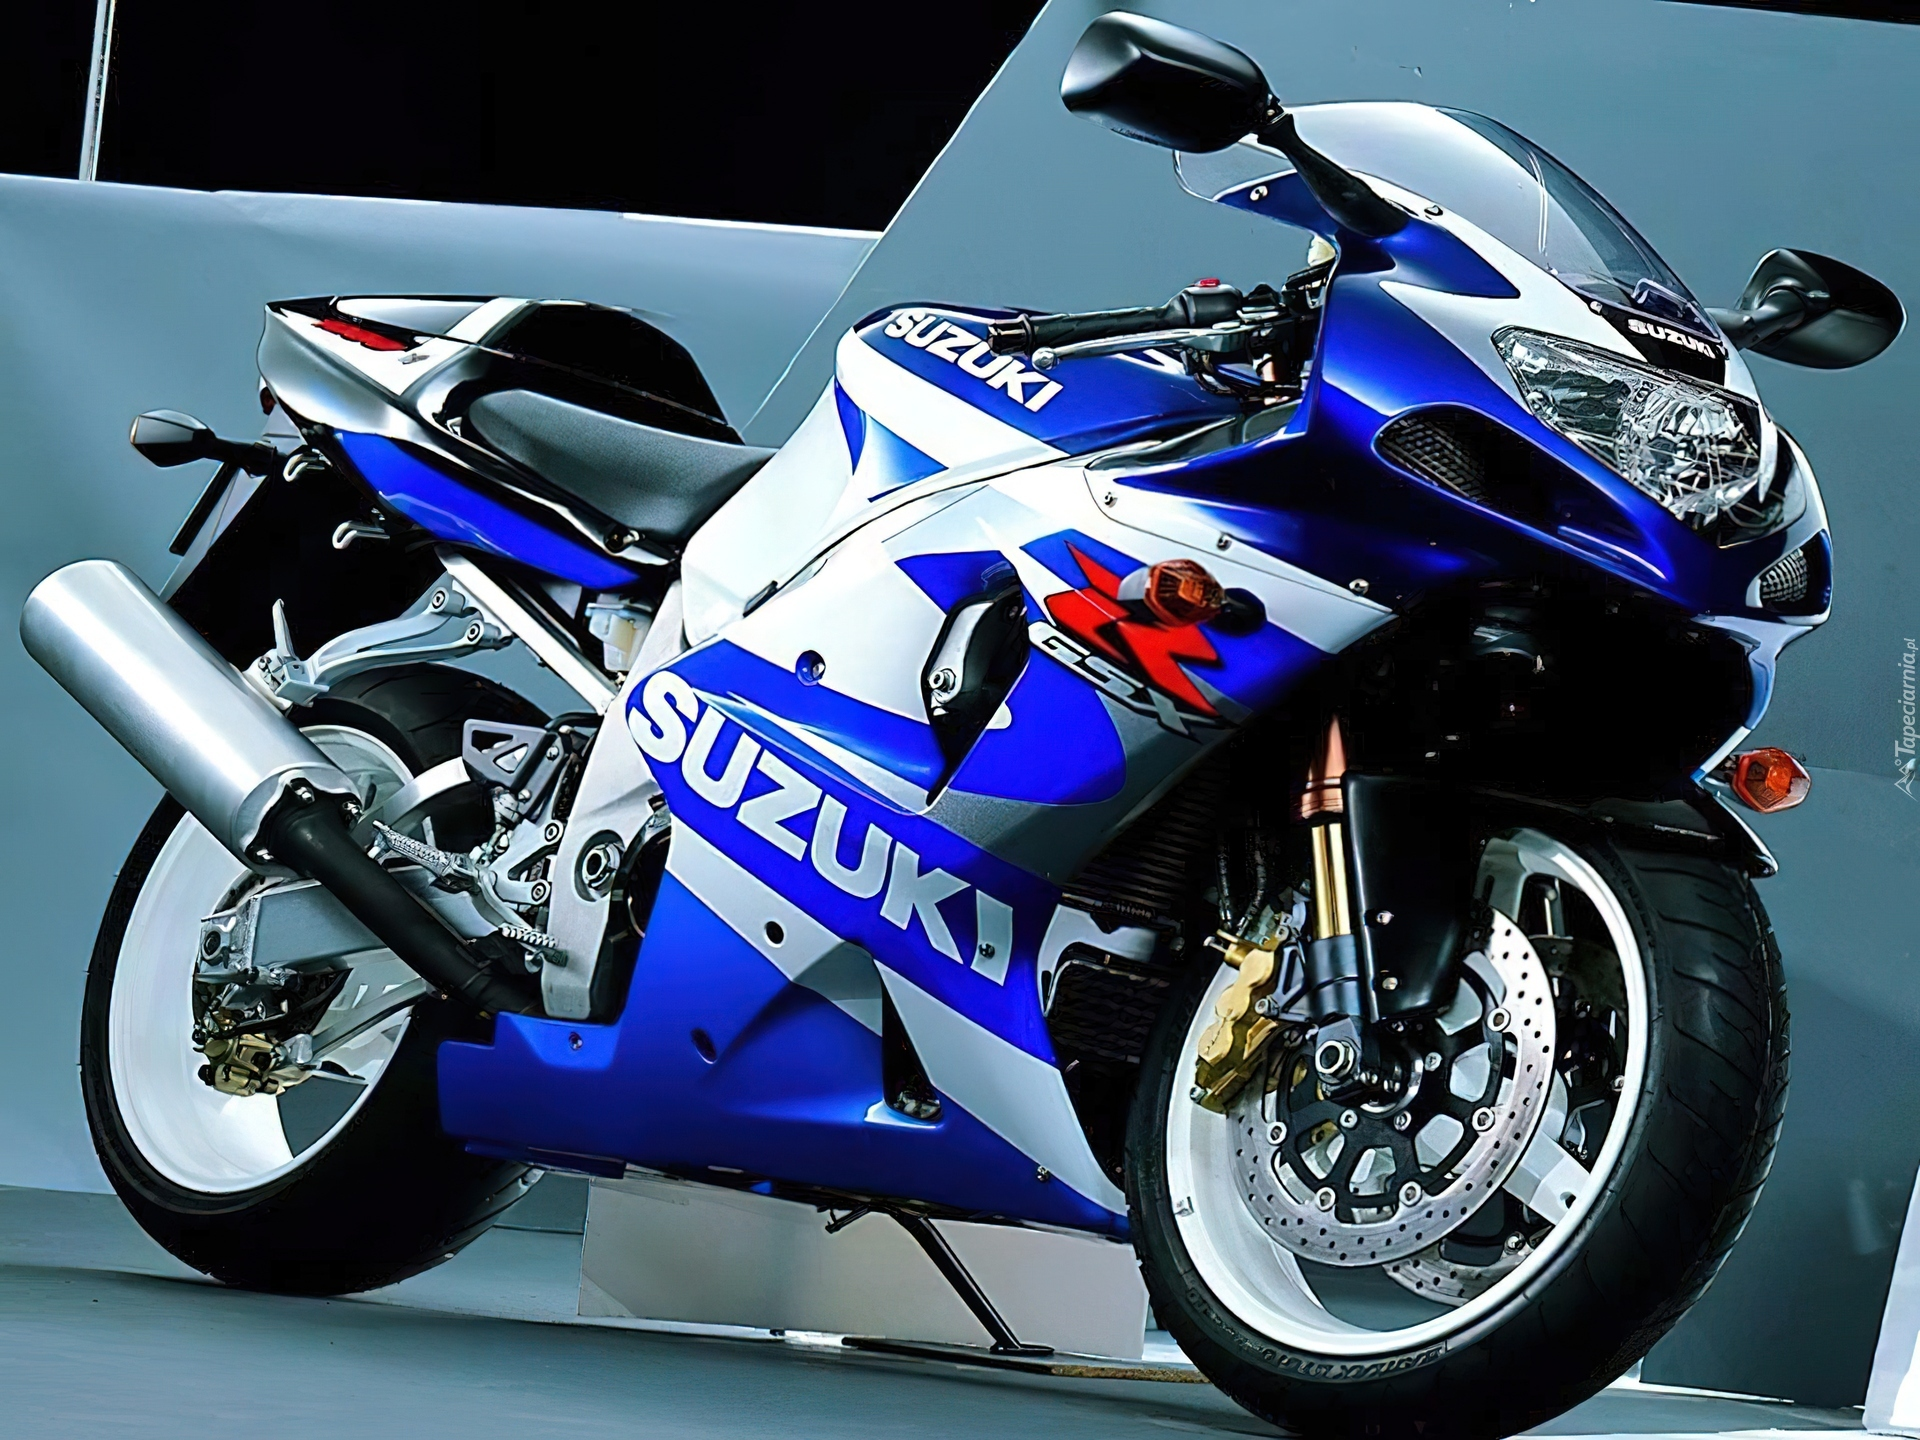 Motory Suzuki Choppery